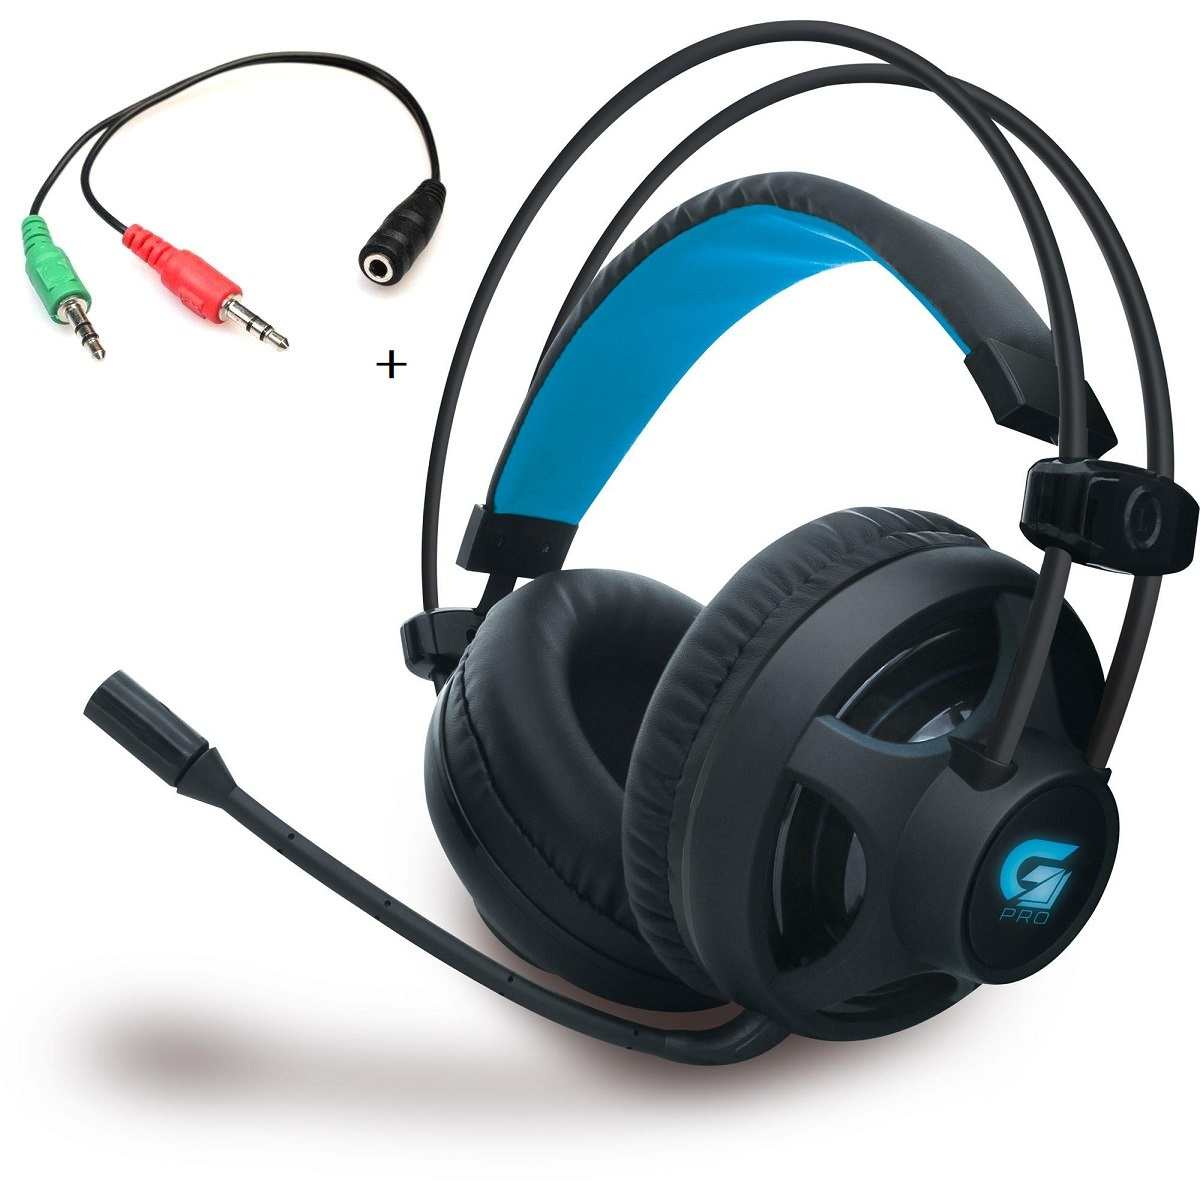 Headset Fone Gamer Pro H2 Fortrek + Adaptador P2